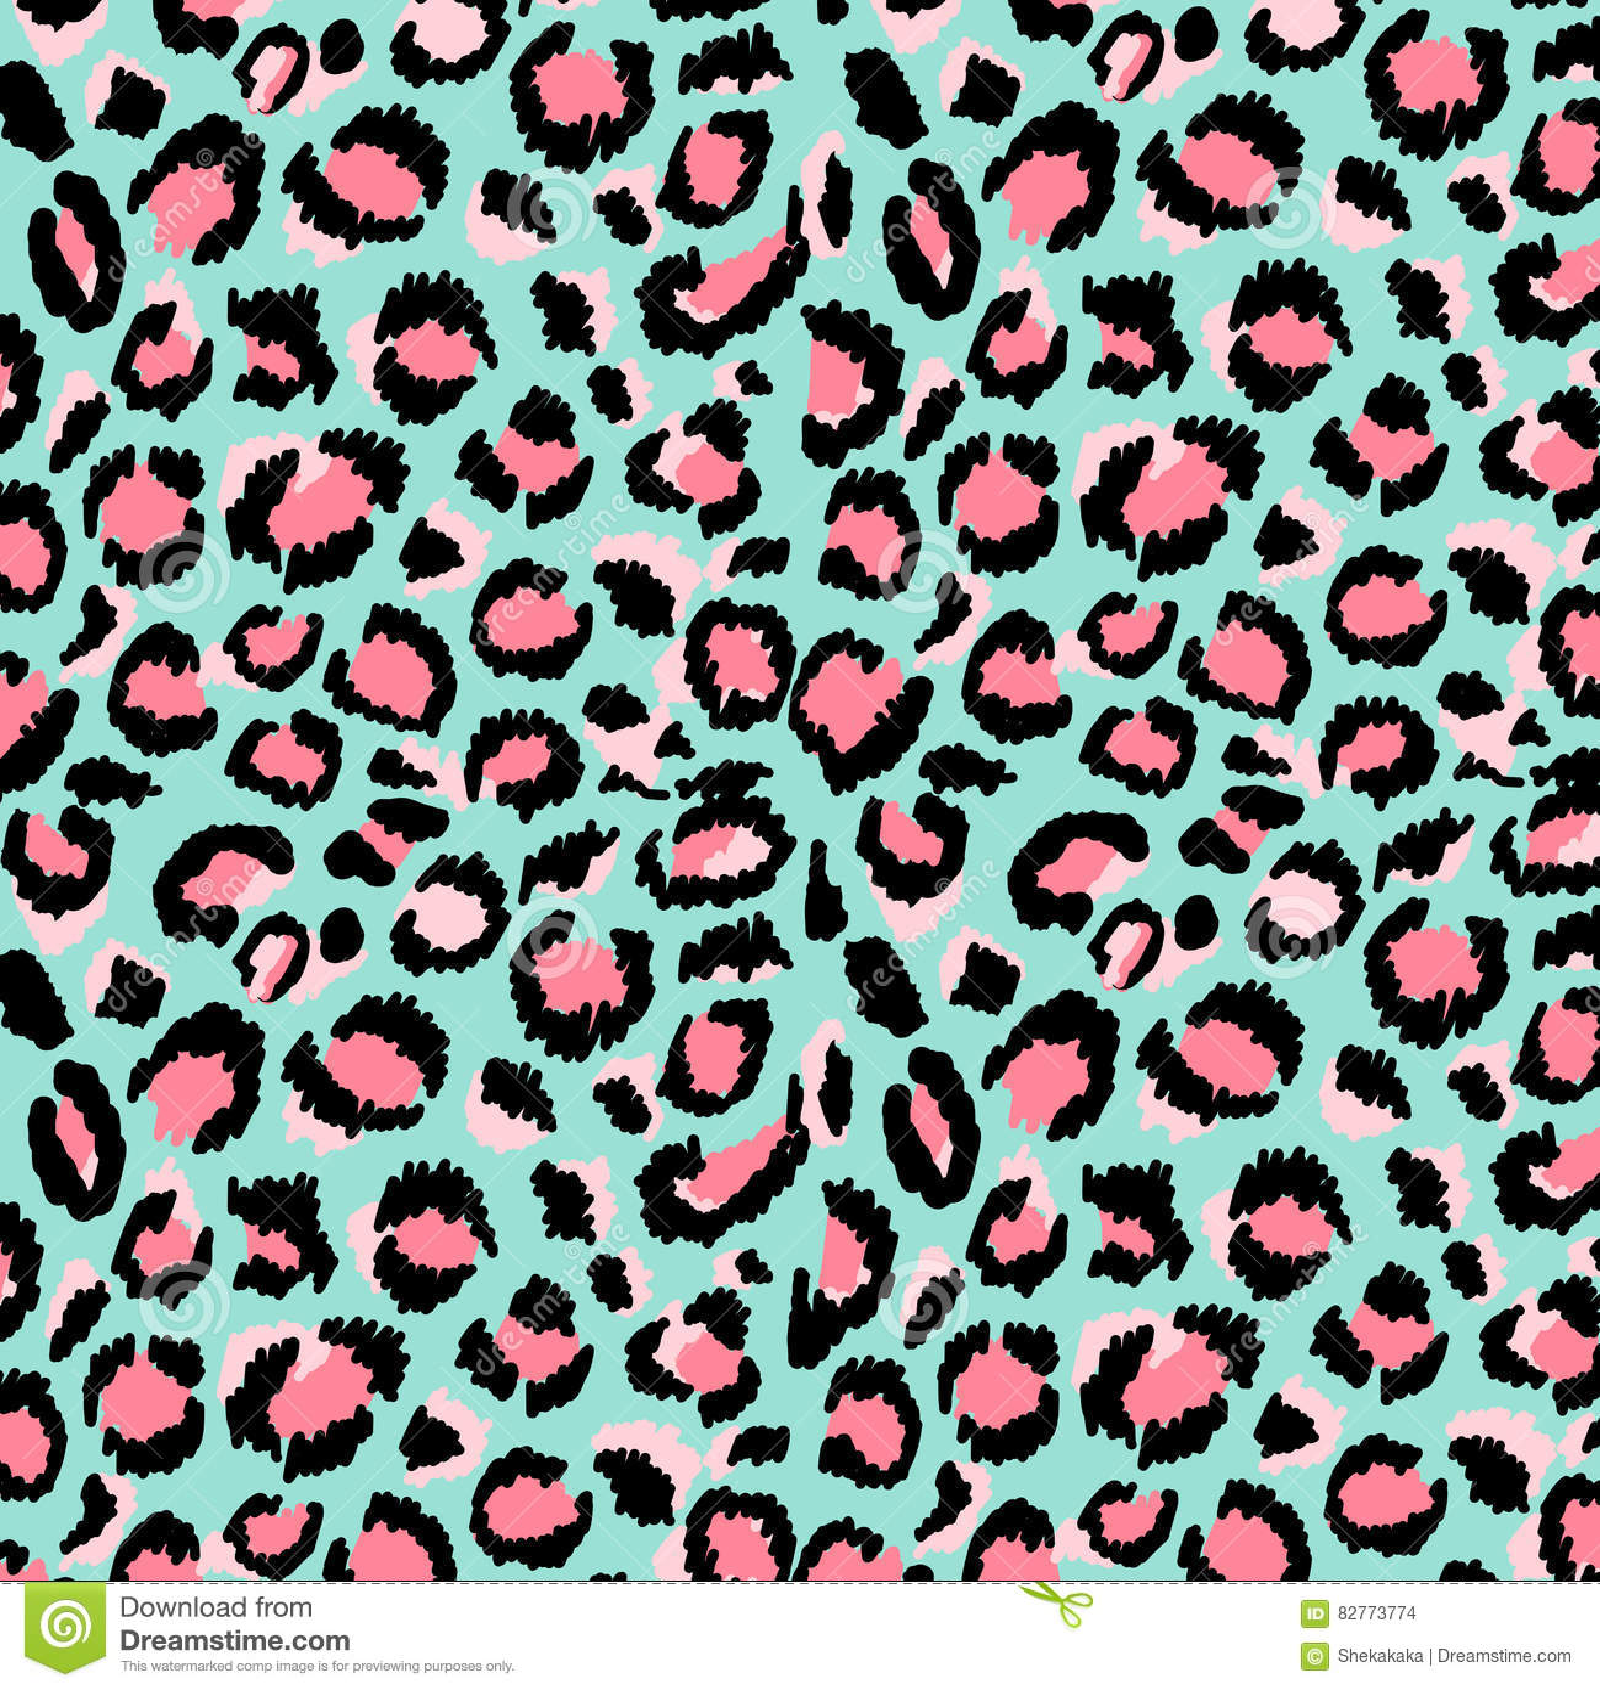 Leopard print stock illustration. Illustration of colorful - 82773774